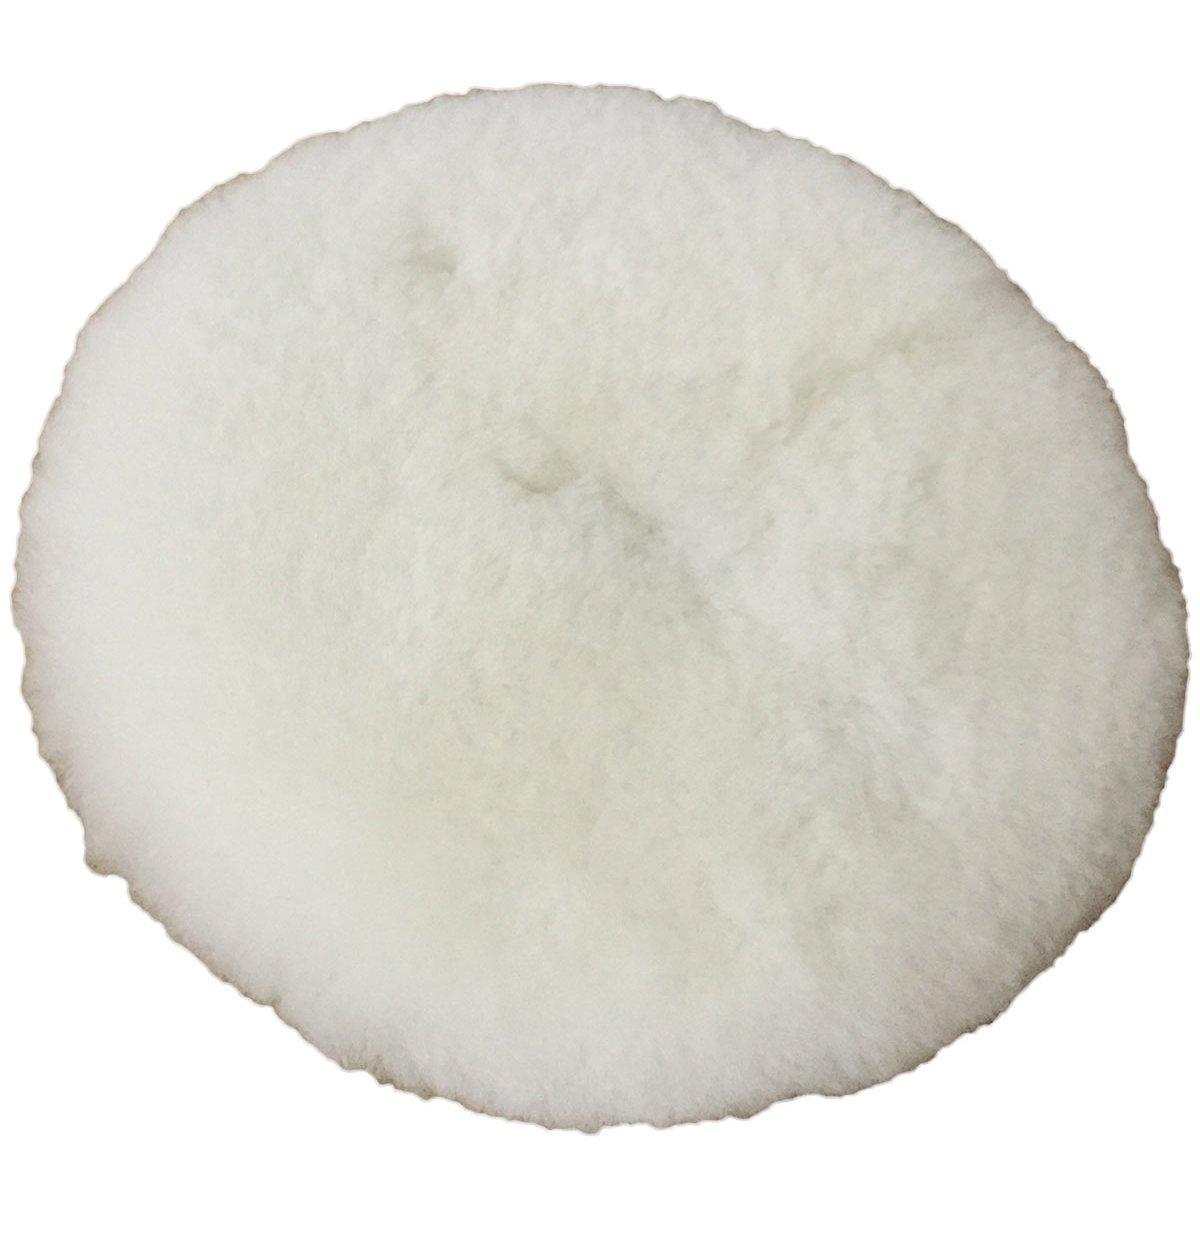 Koch Chemie Lammfell-pad меховой круг 150 мм